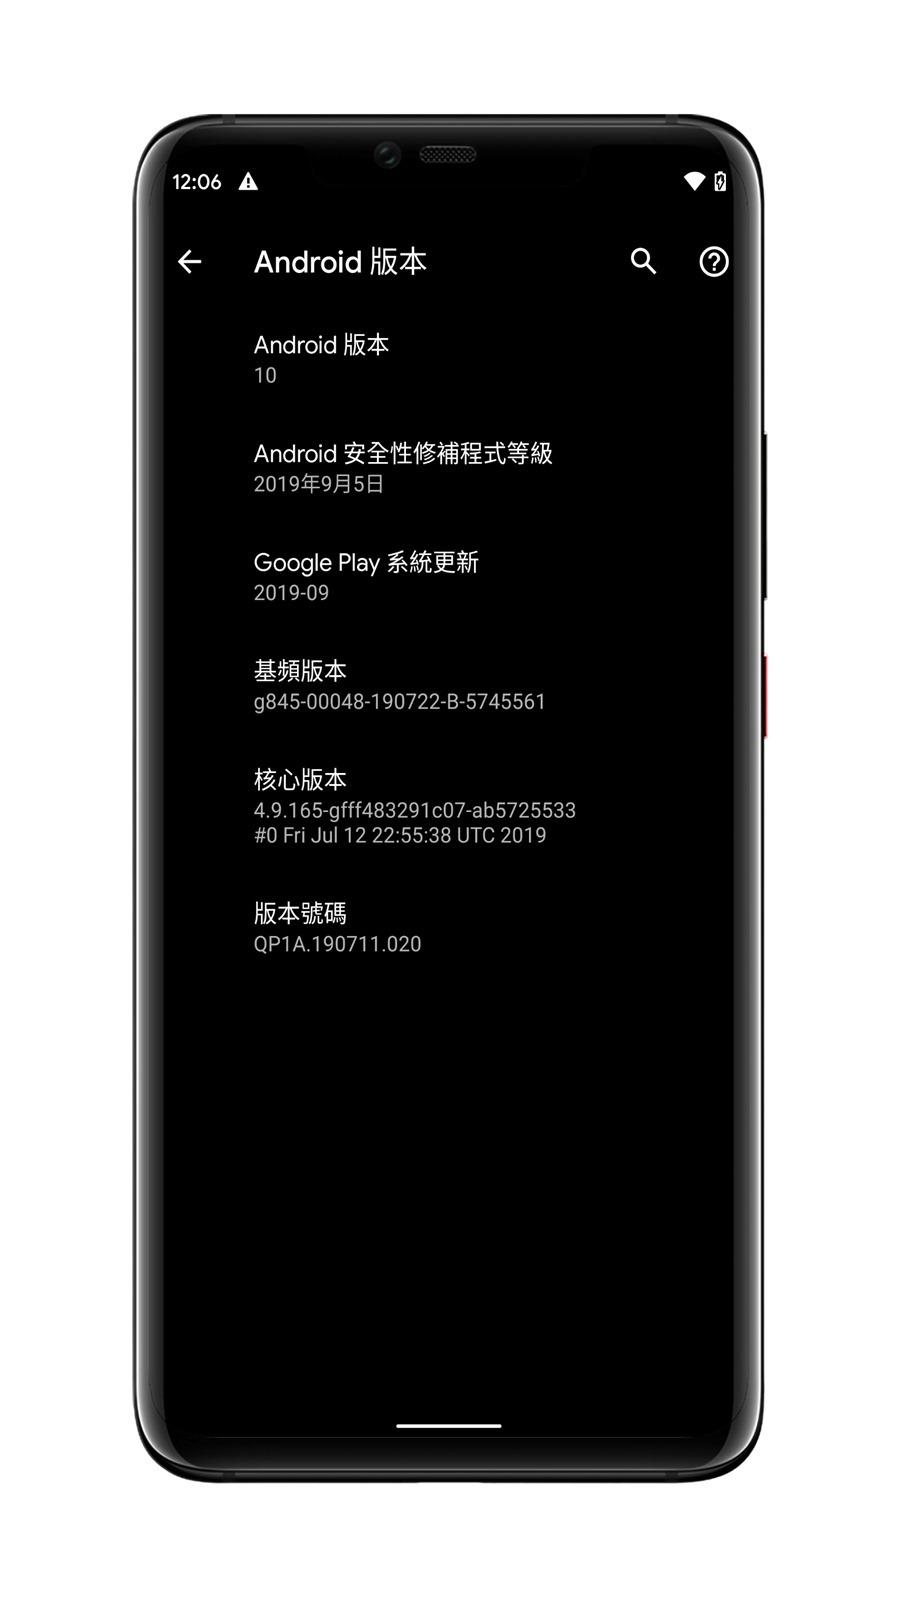 Android 10 正式推出!Pixel 手機已經開放更新,看看 Android 10 有哪些新功能?其他廠商還要再等等 @3C 達人廖阿輝